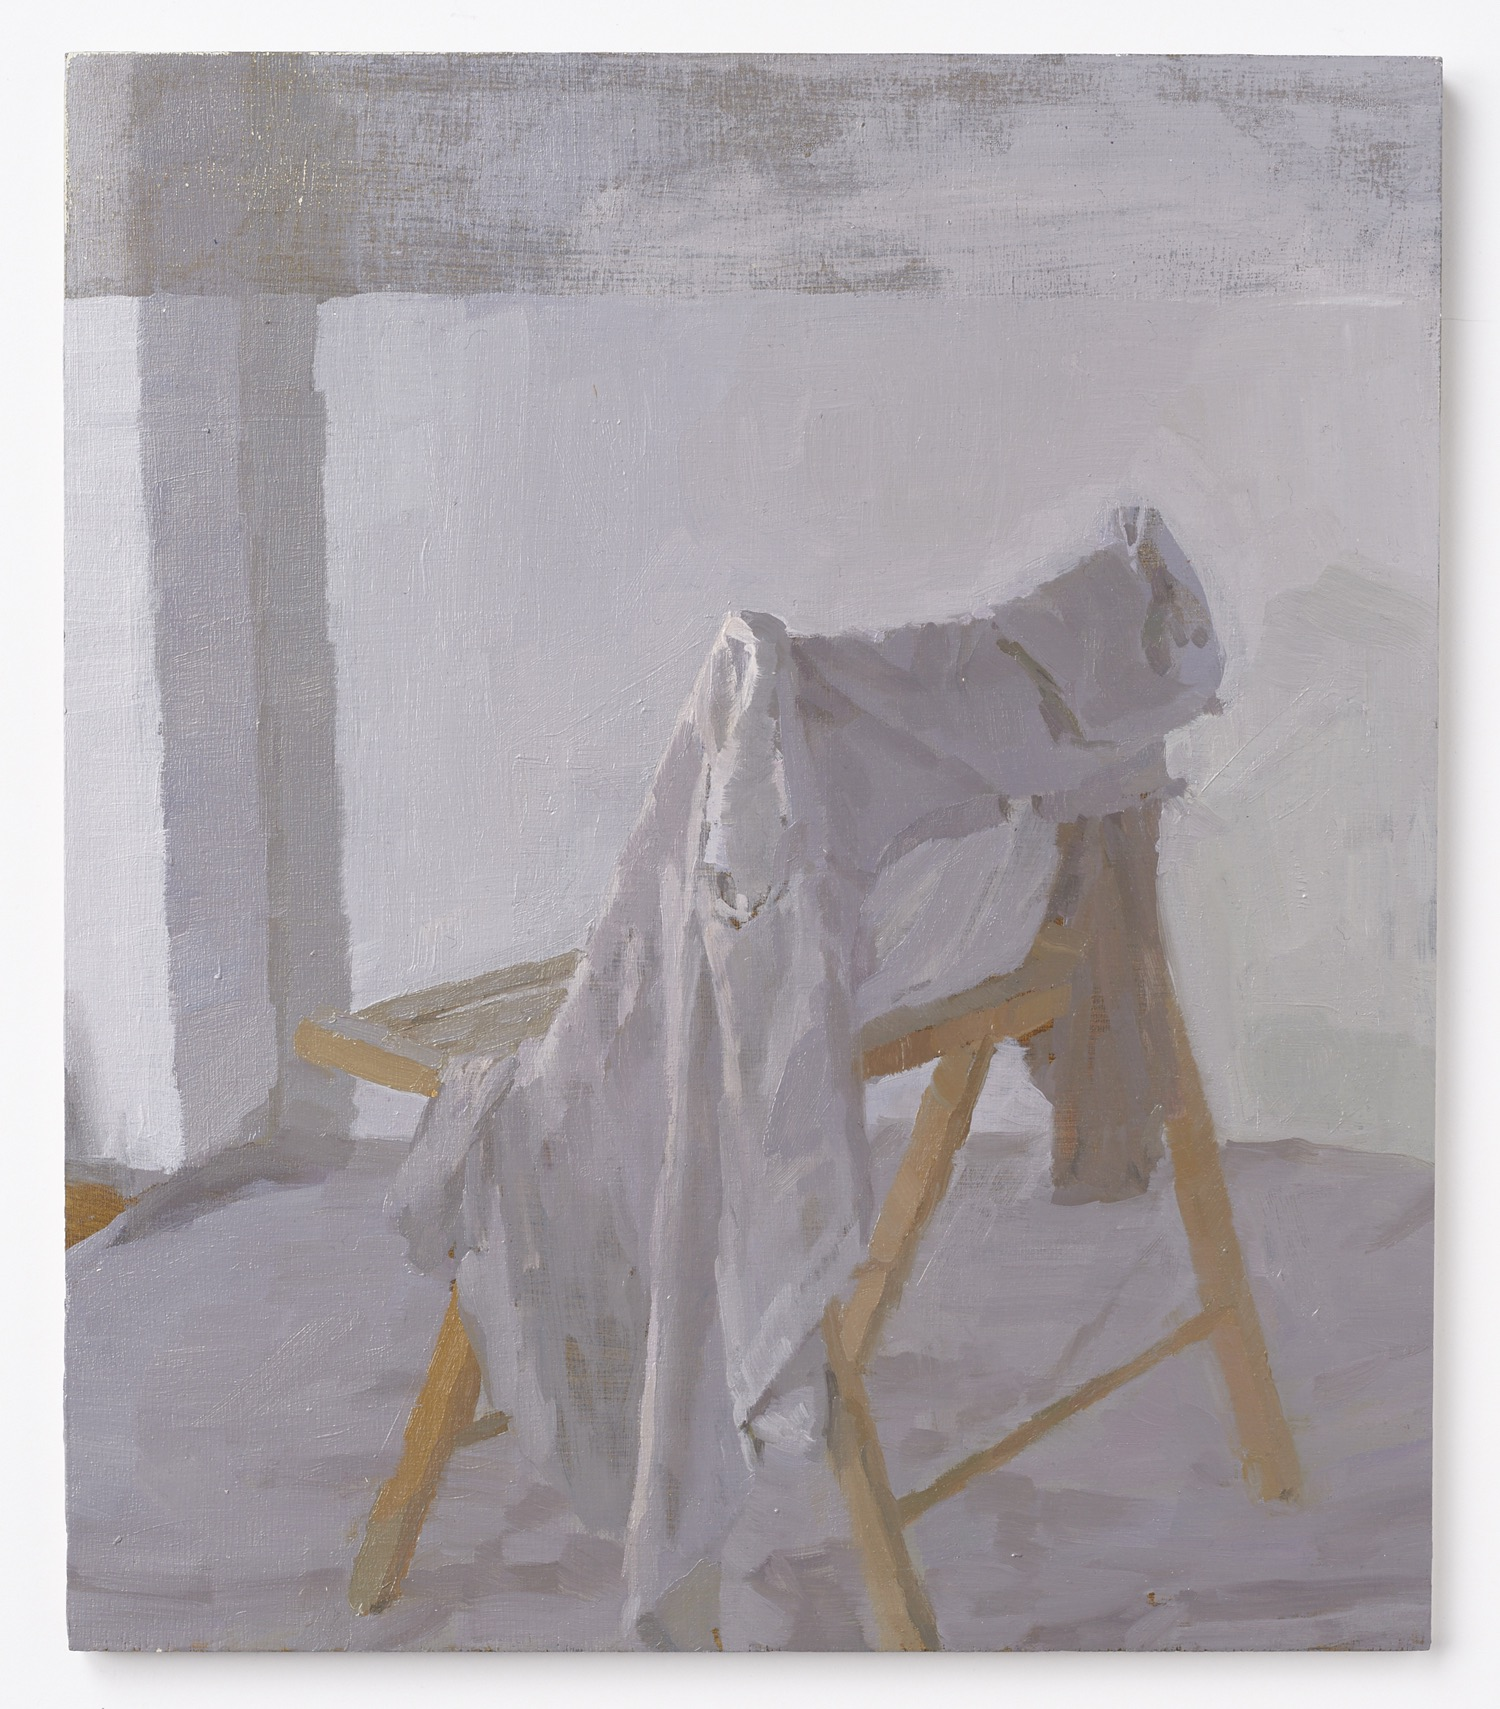 I rommet XV, 2018, Oil on plywood, 30 x 40 cm